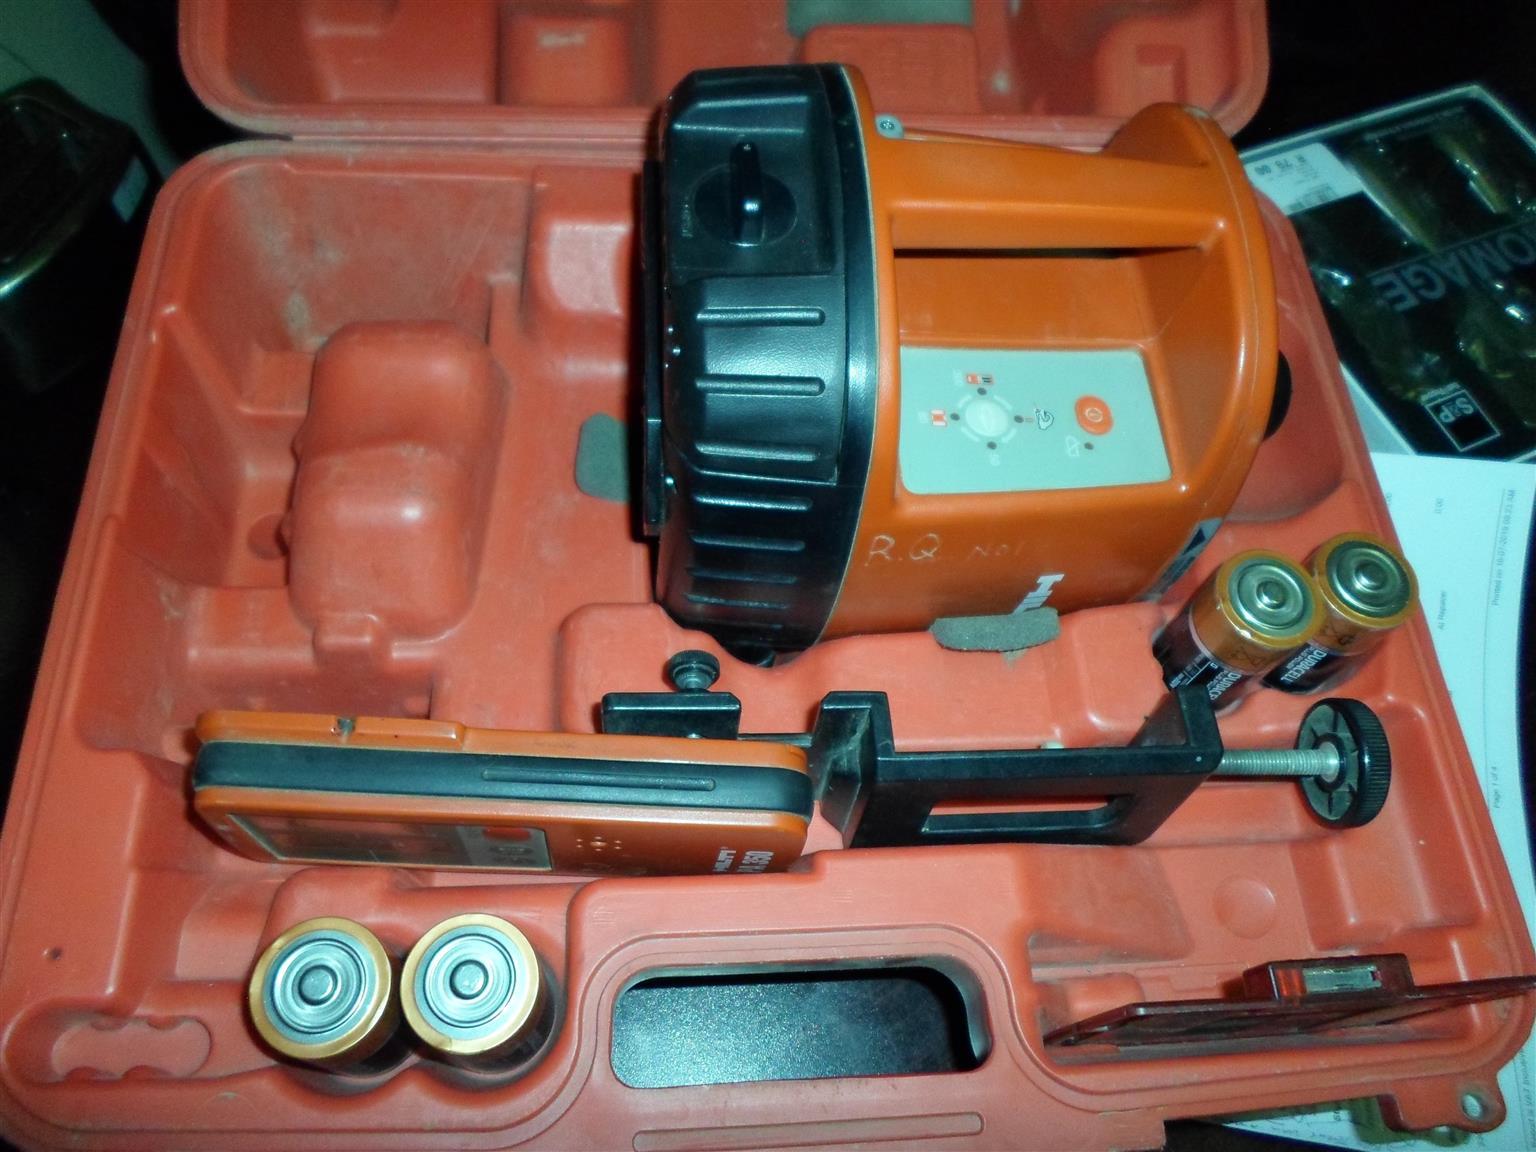 Hilti PR16 Laser Equipment + Accessories